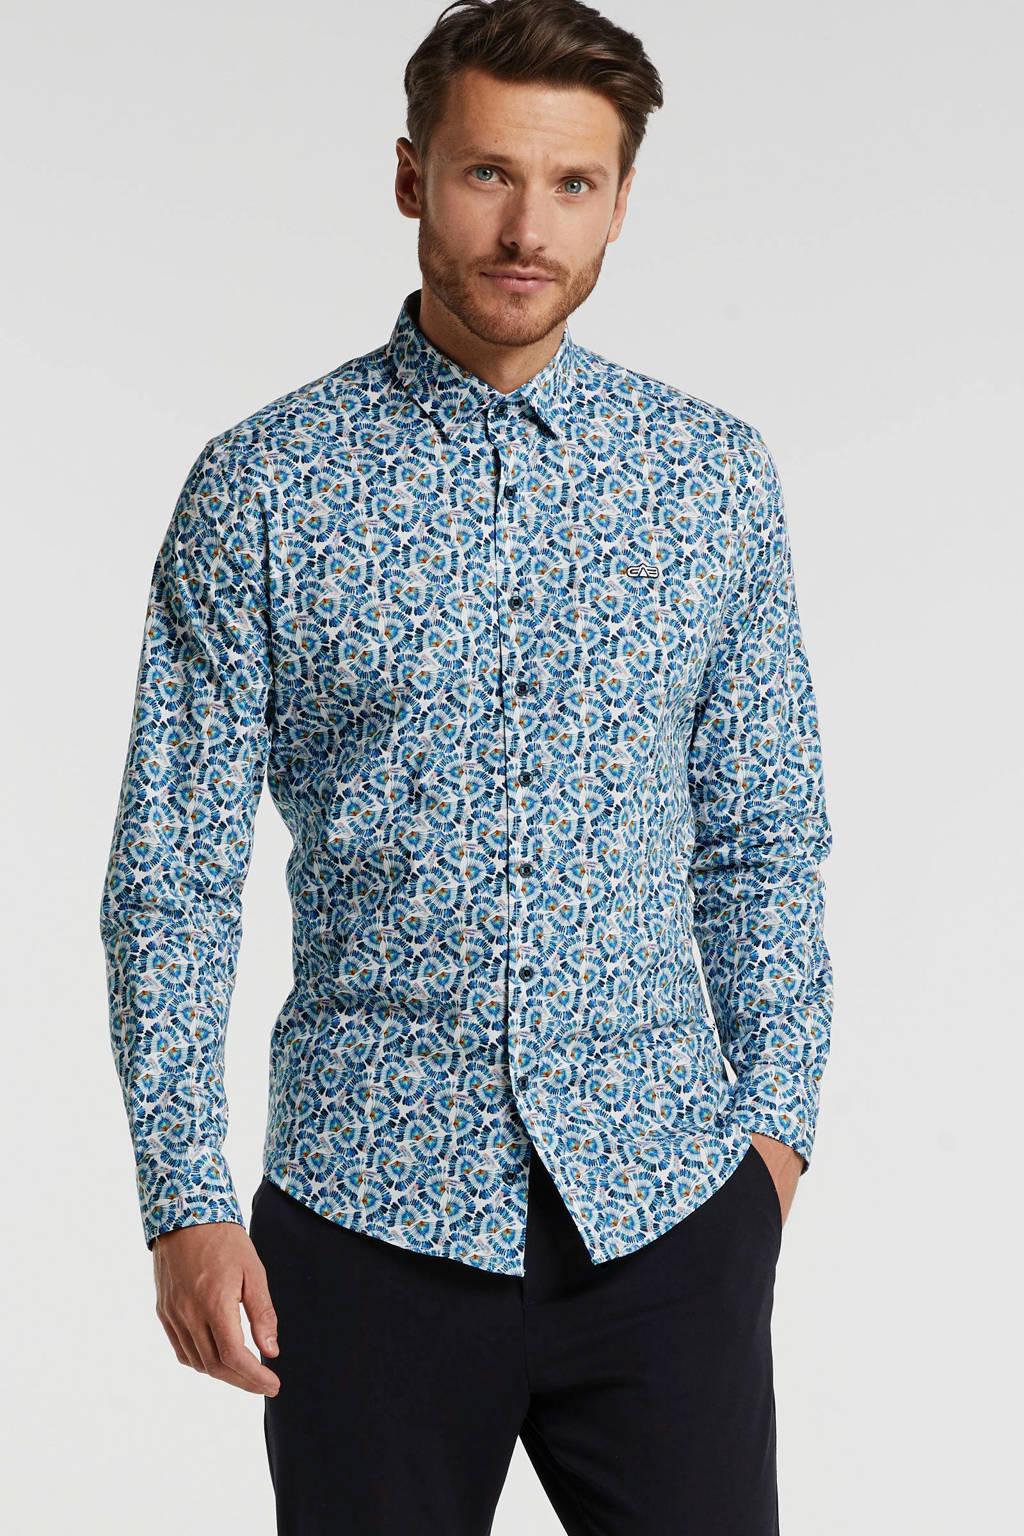 GABBIANO gebloemd slim fit overhemd wit, Wit